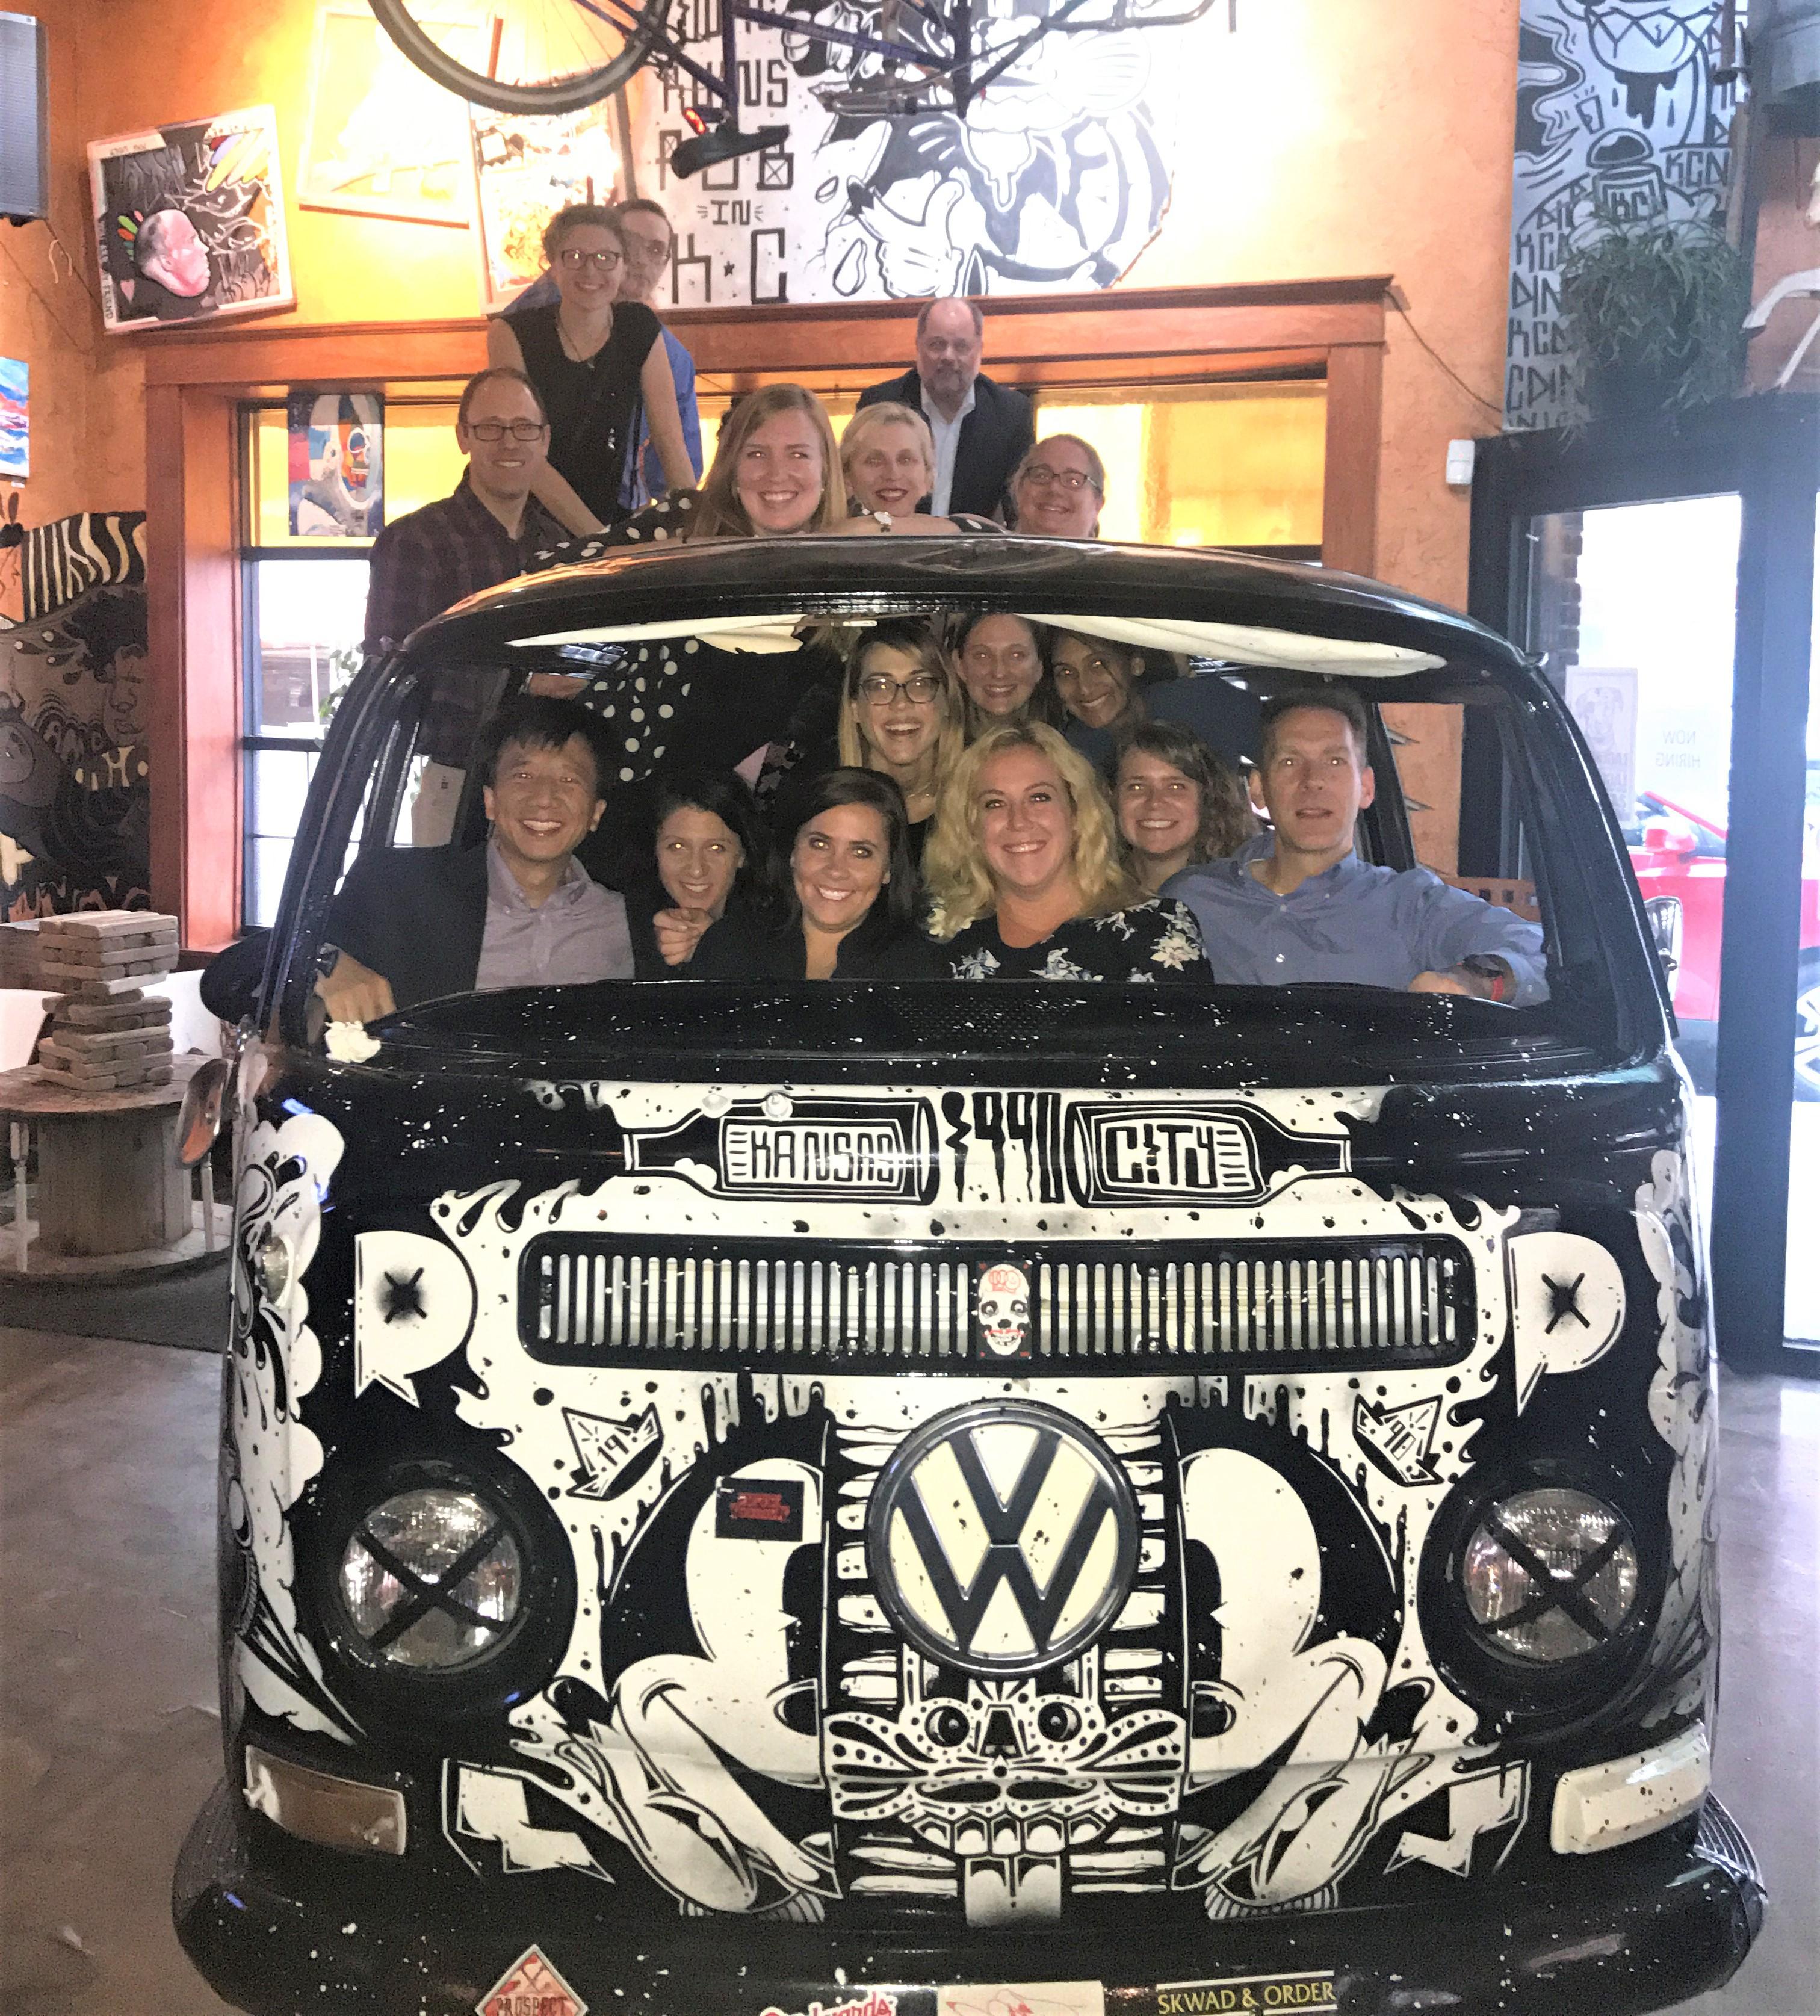 Group Photo of Department Members in VW Bus